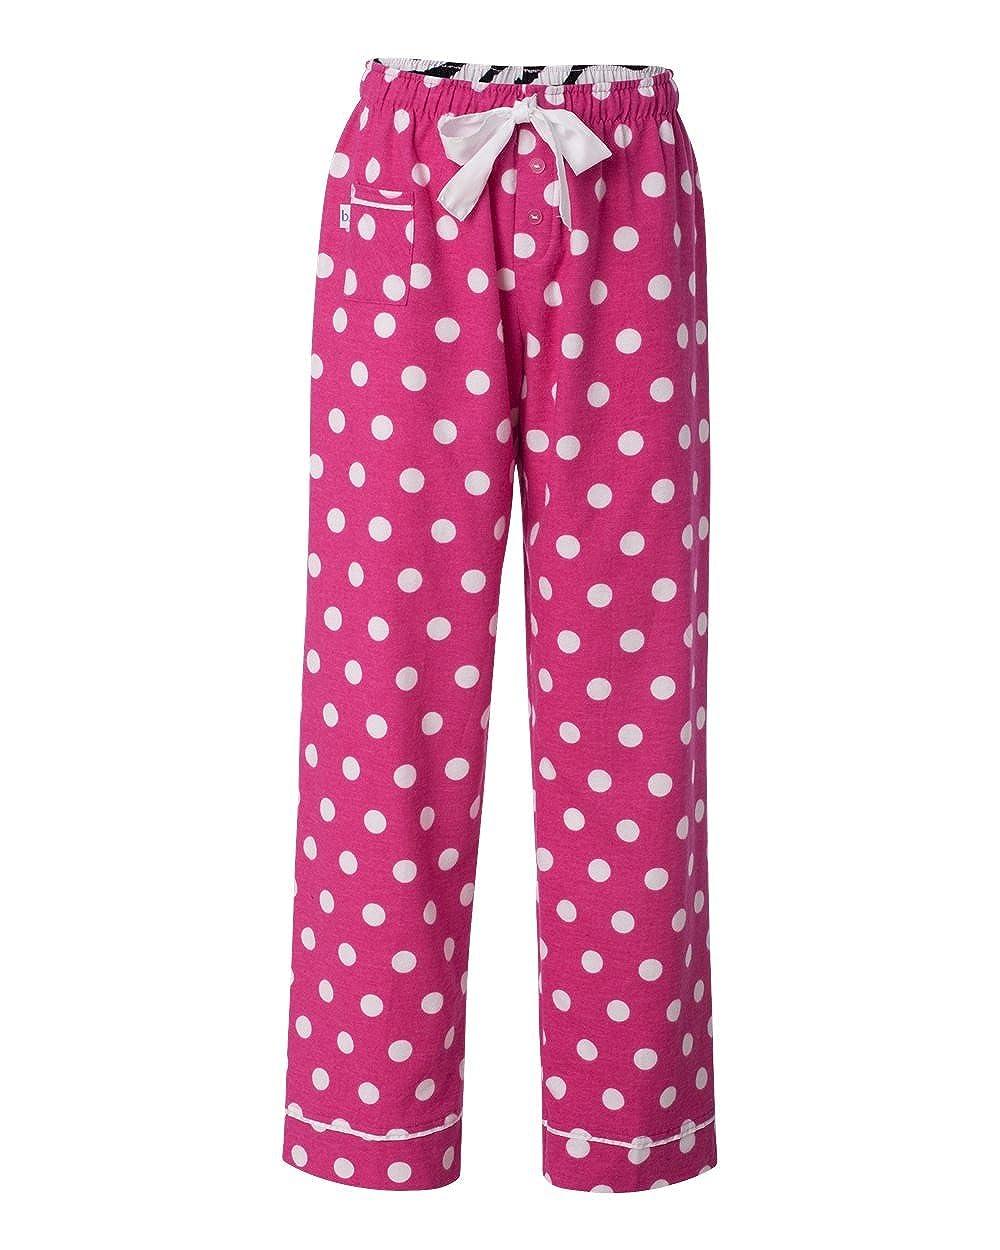 Boxercraft F16 Ladies VIP Flannel Pants